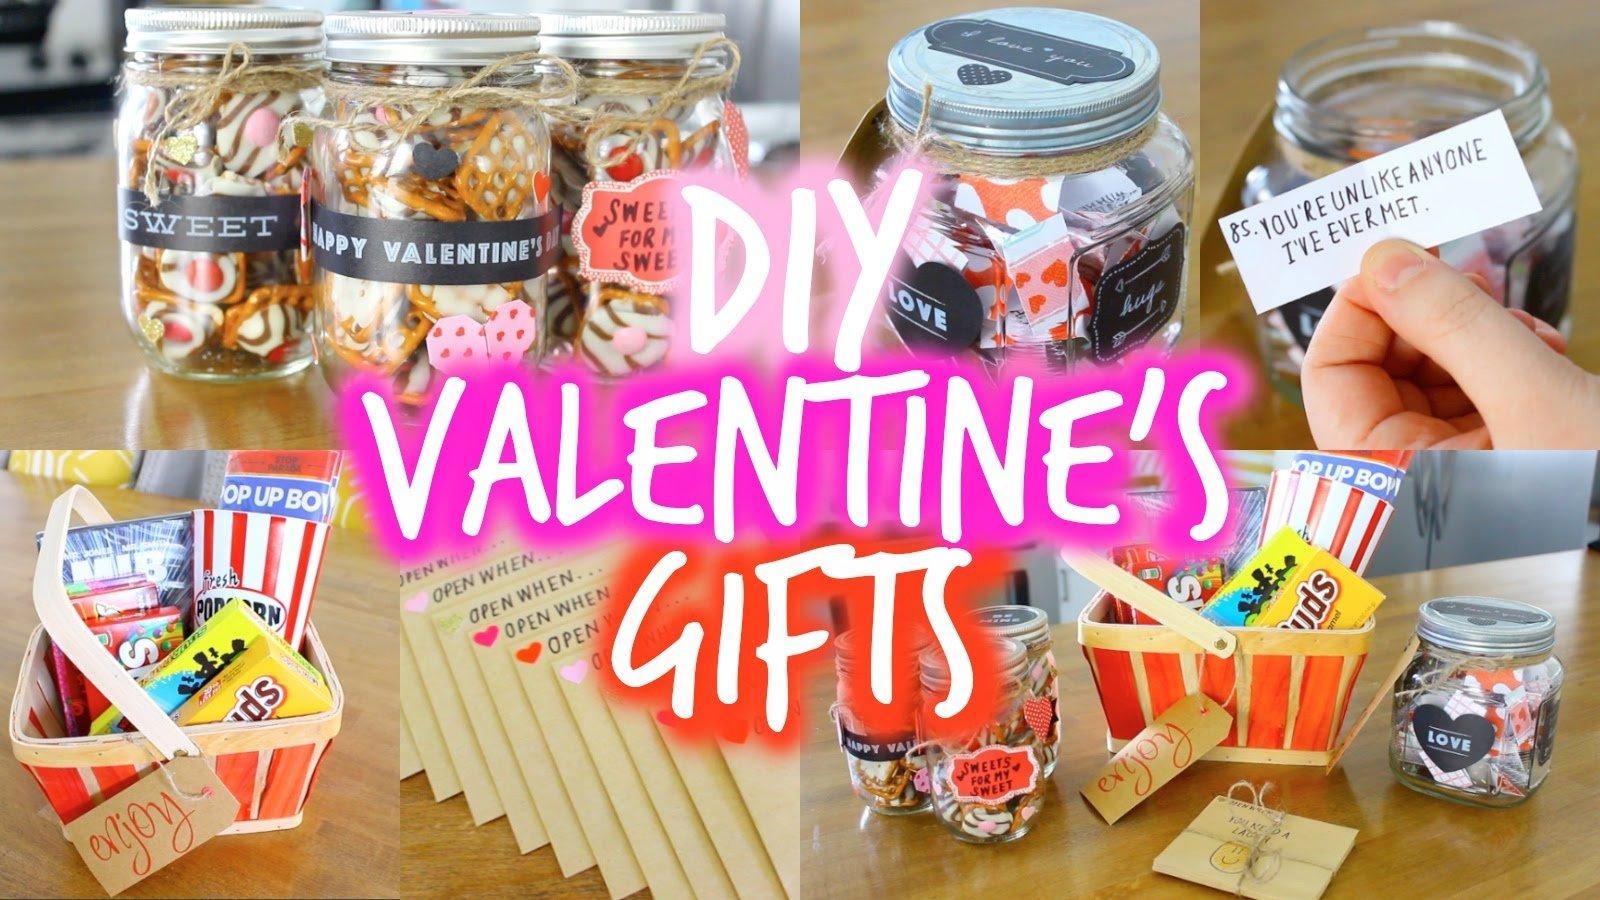 10 Cute Ideas For Boyfriend Valentines Day easy diy valentines day gift ideas for your boyfriend youtube 49 2020